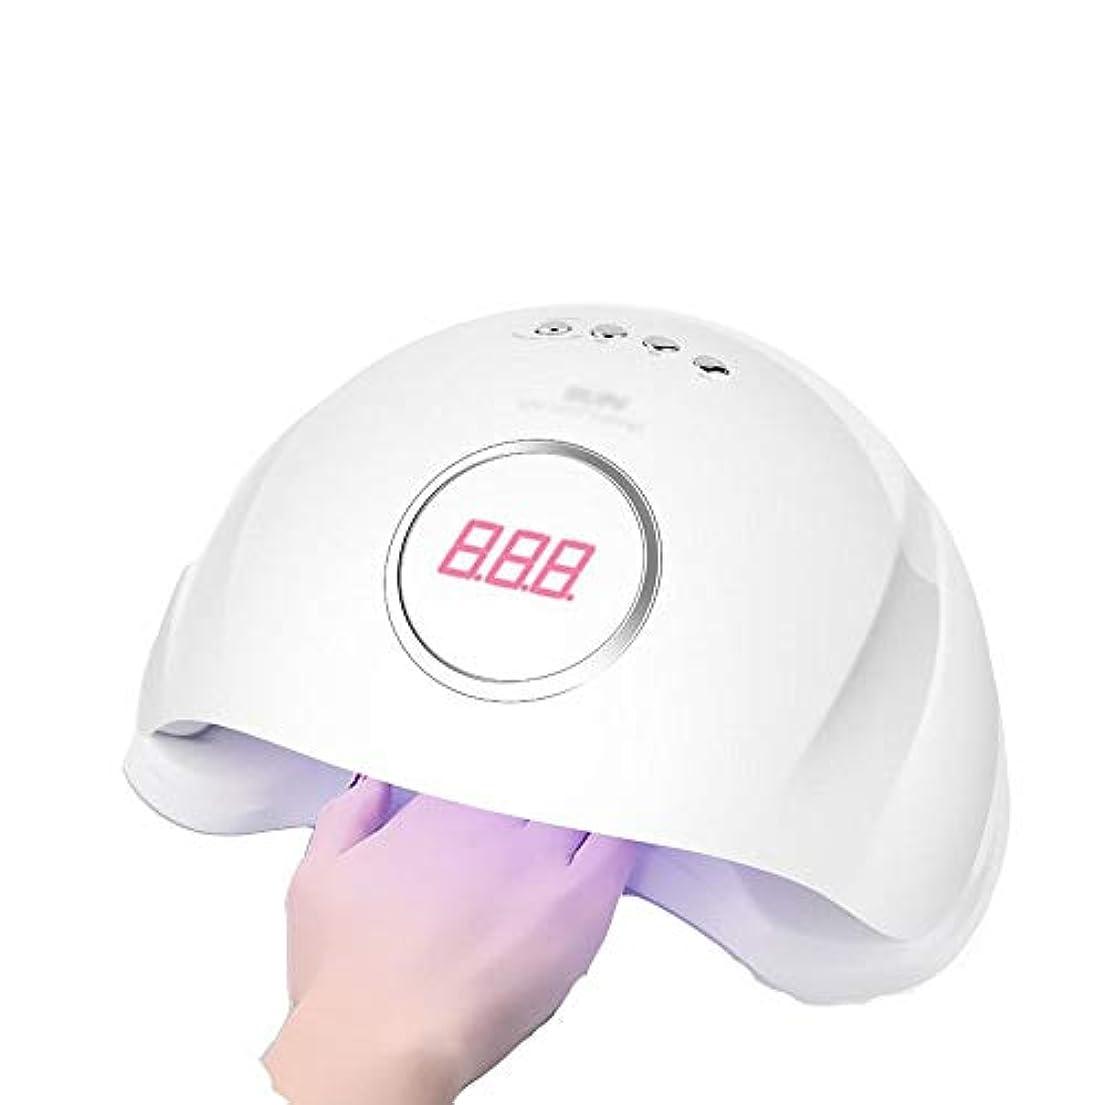 YESONEEP 108Wネイル光線療法ランプLED無痛光線療法機10秒にすべての接着剤を乾燥させる (Size : 108W power)